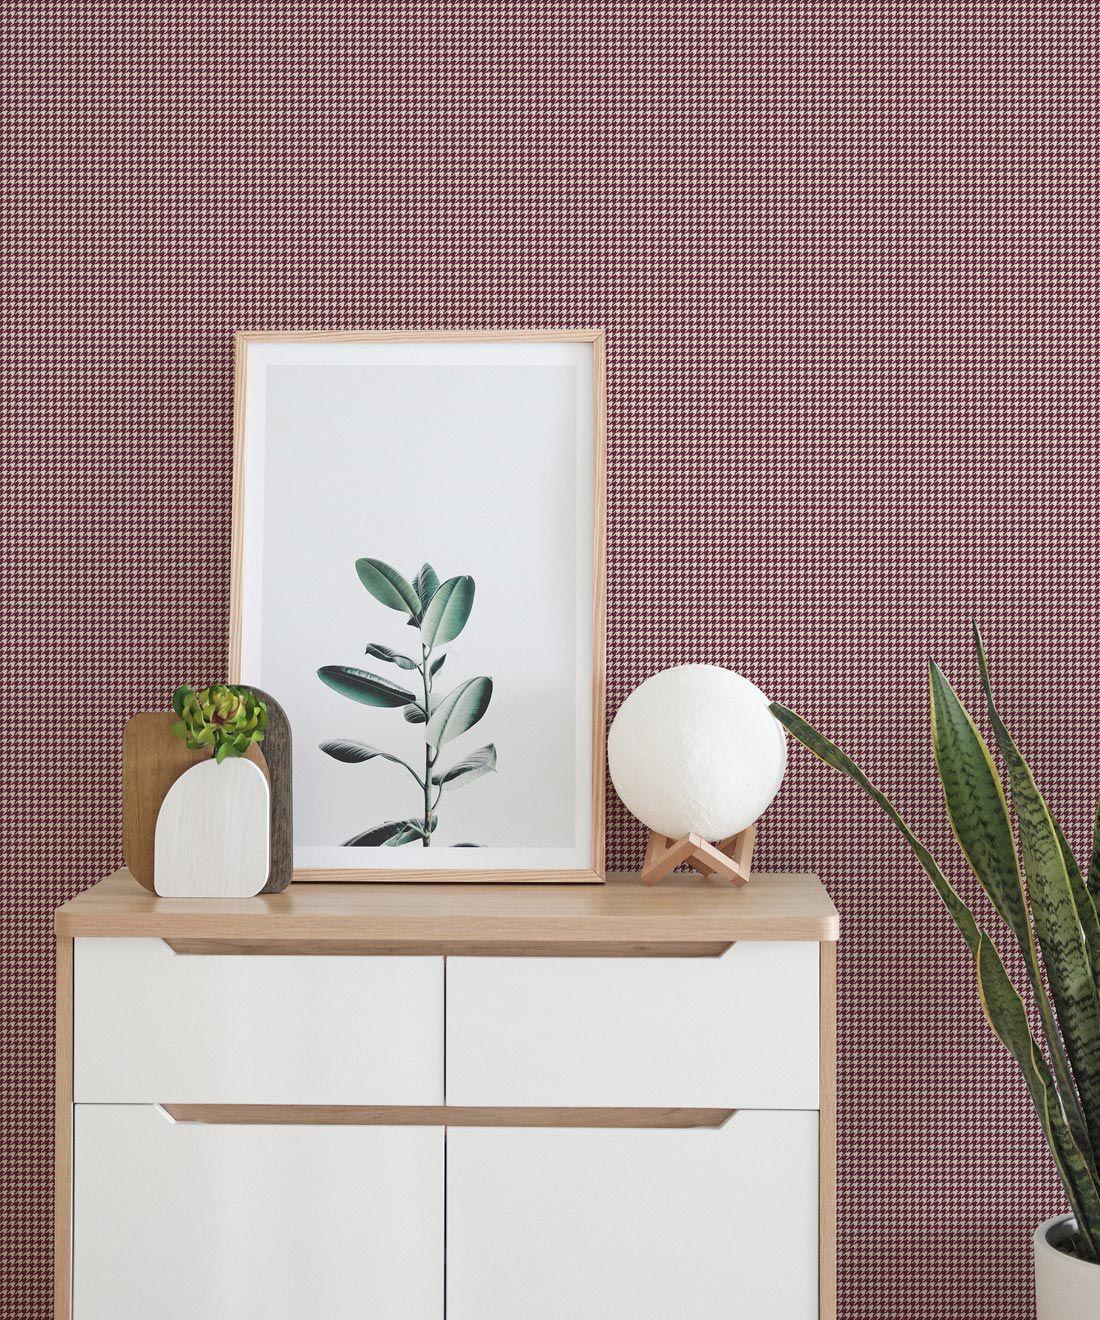 Houndstooth Wallpaper • Dogstooth Wallpaper • Ron Burgundy •Insitu